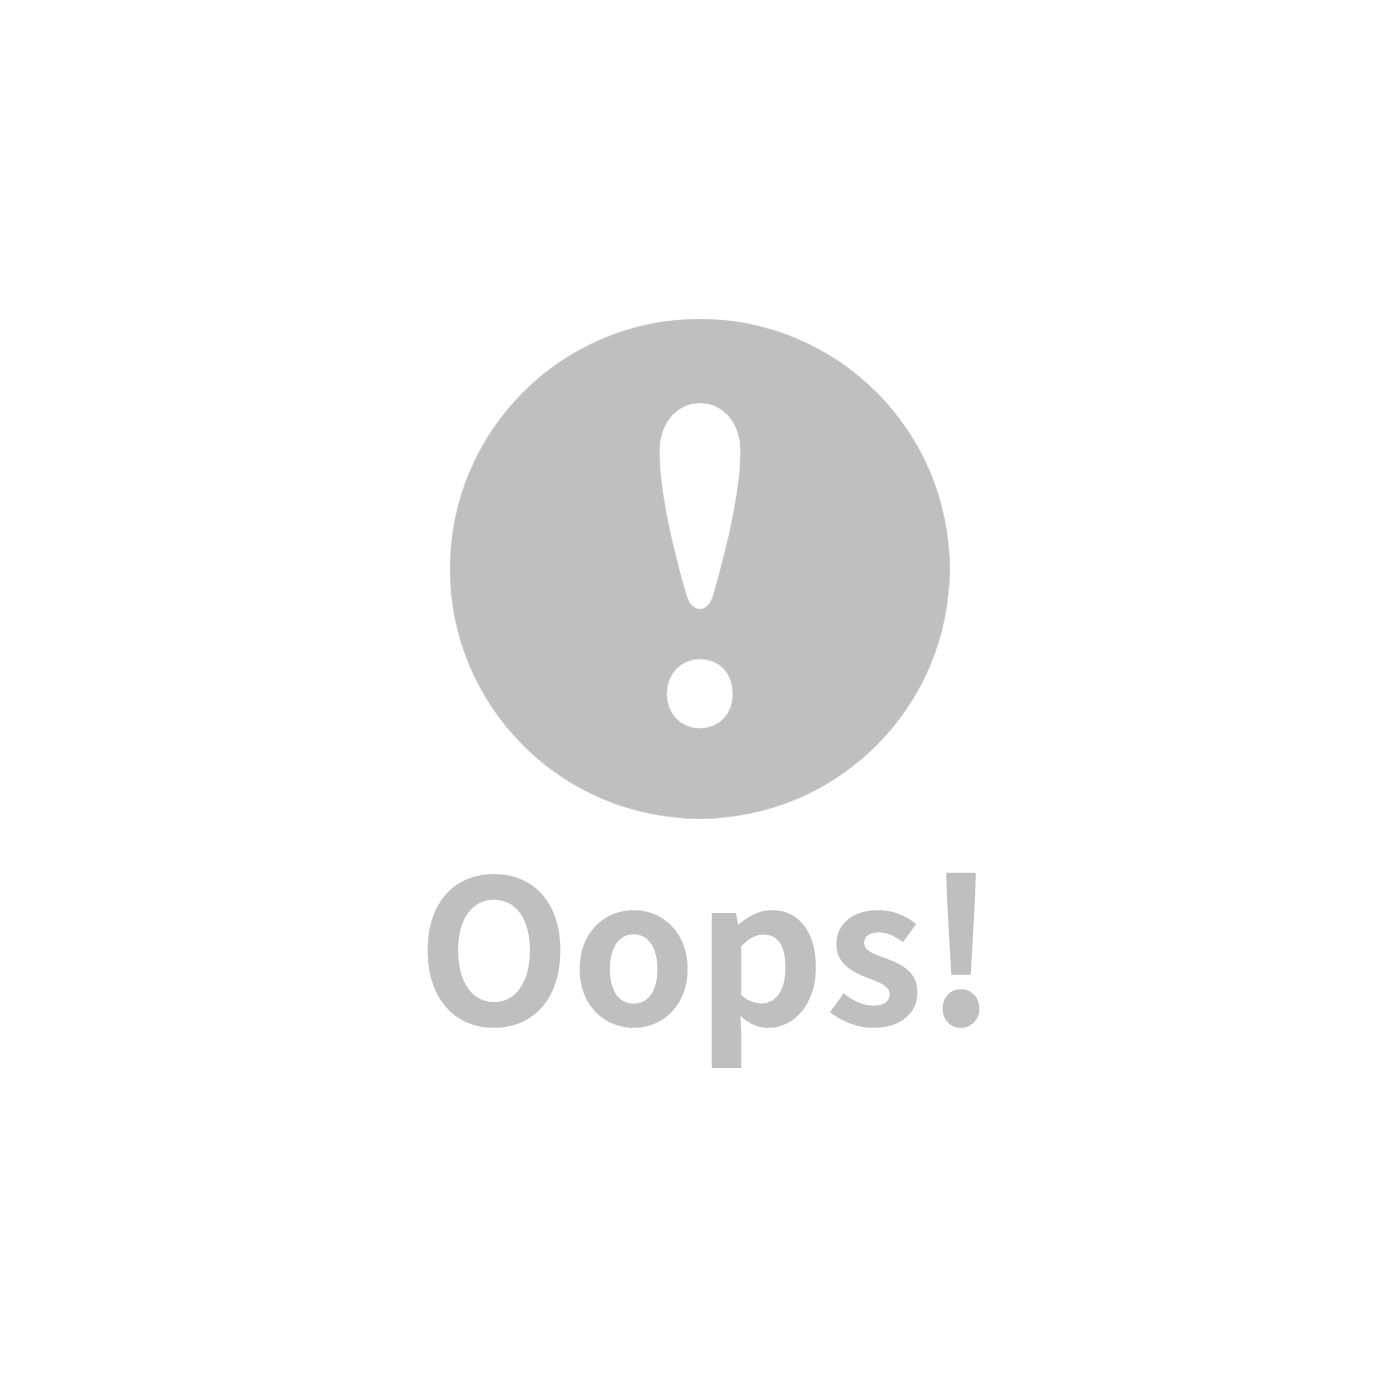 La Millou Jersey時尚篷篷浴巾_標準0-2Y- 騎士獨角獸(銀河星空灰)